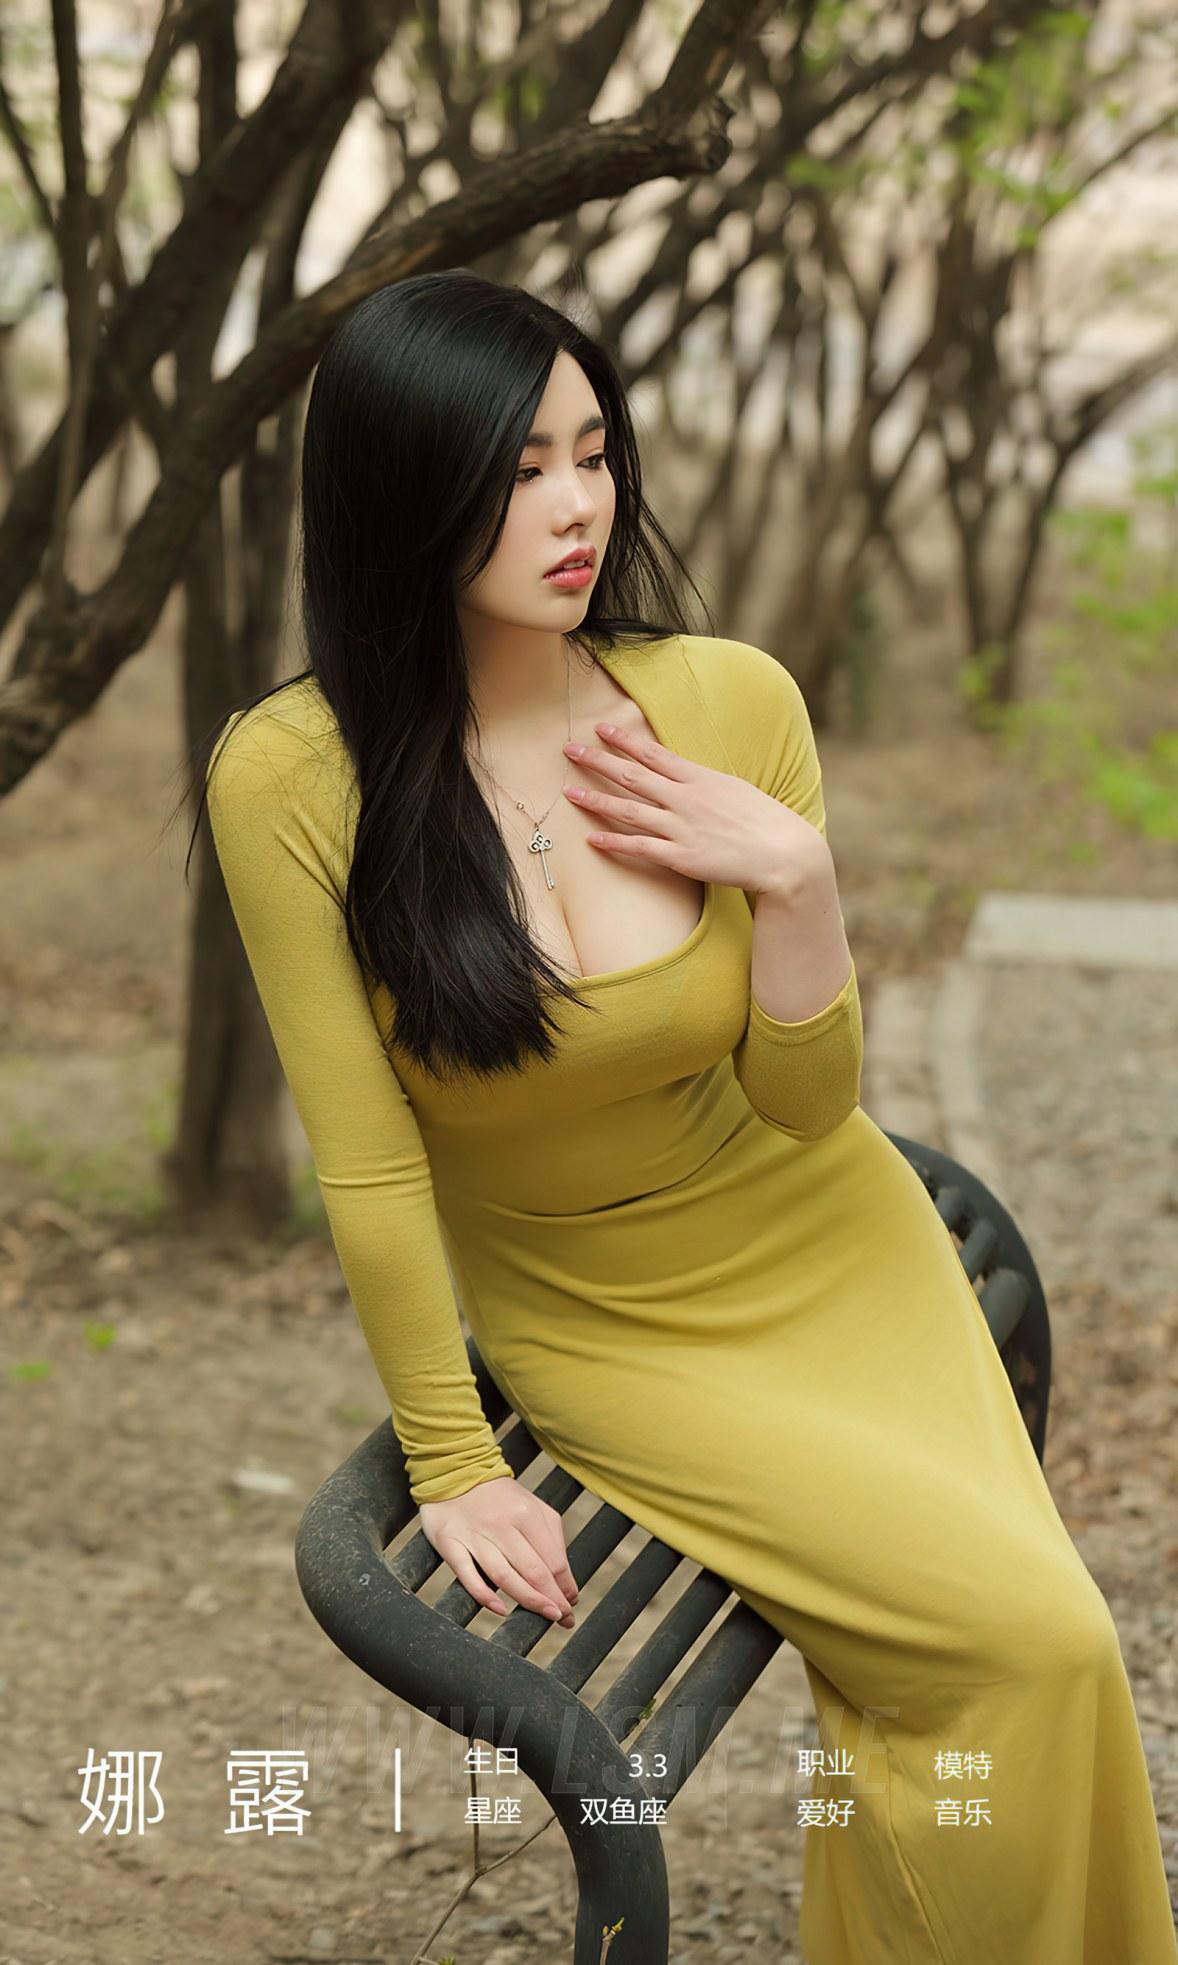 UGirls 爱尤物 No.2074 娜露 赏春 - 4